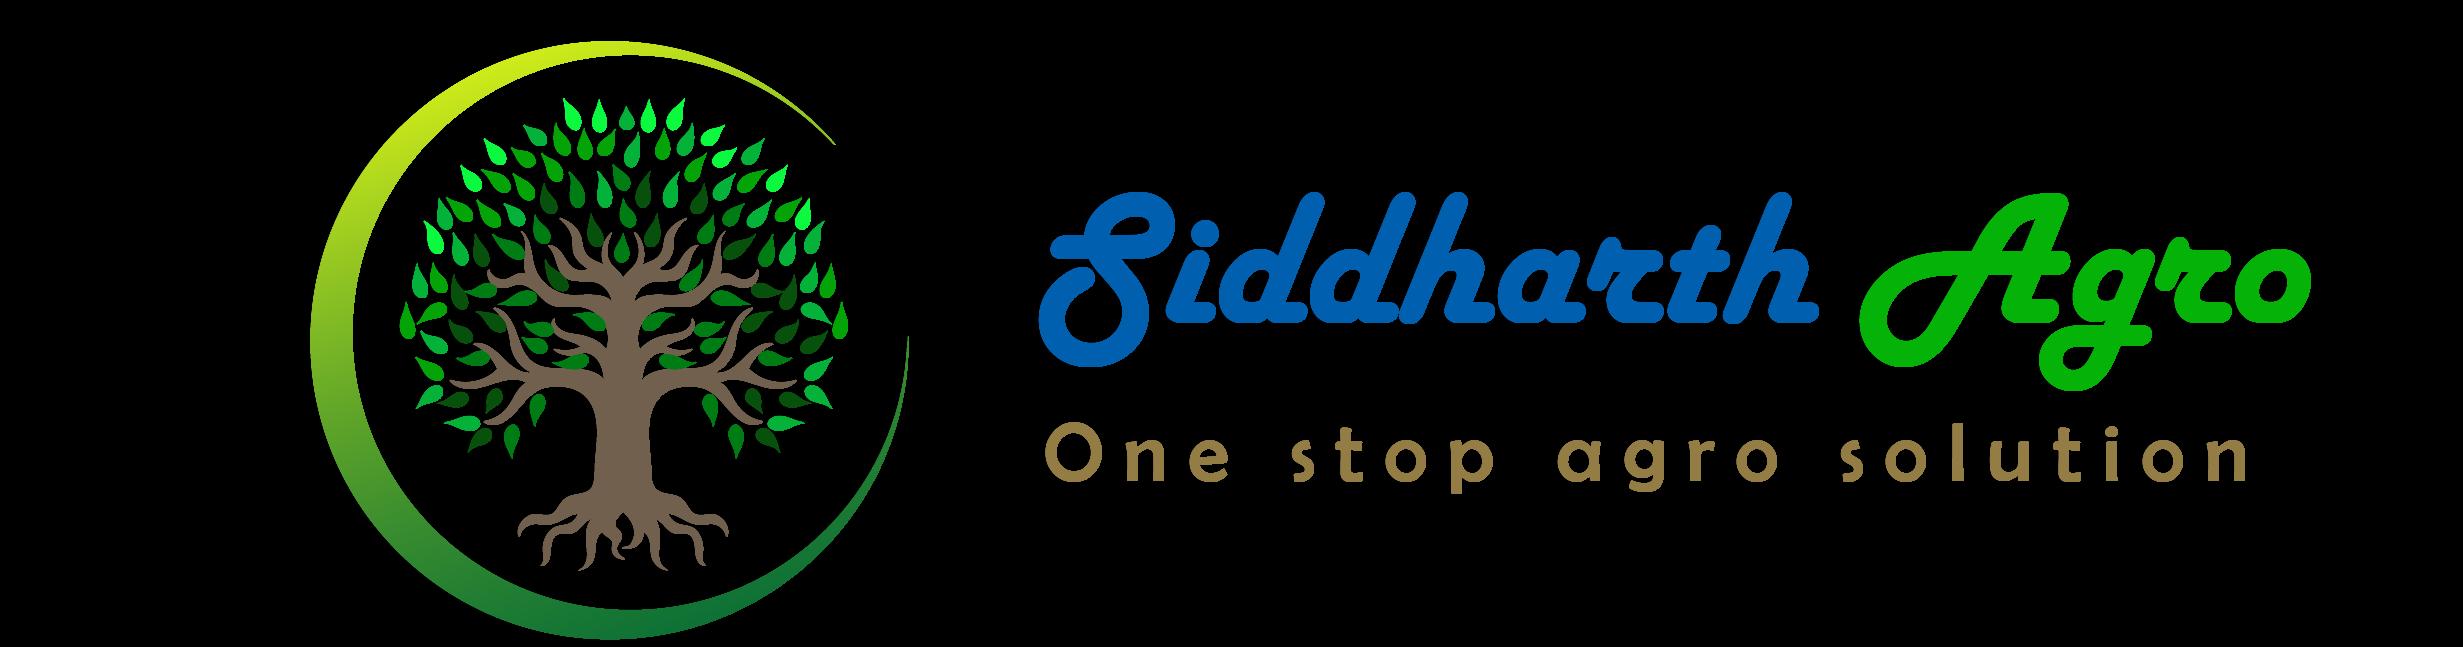 Siddharth Agro